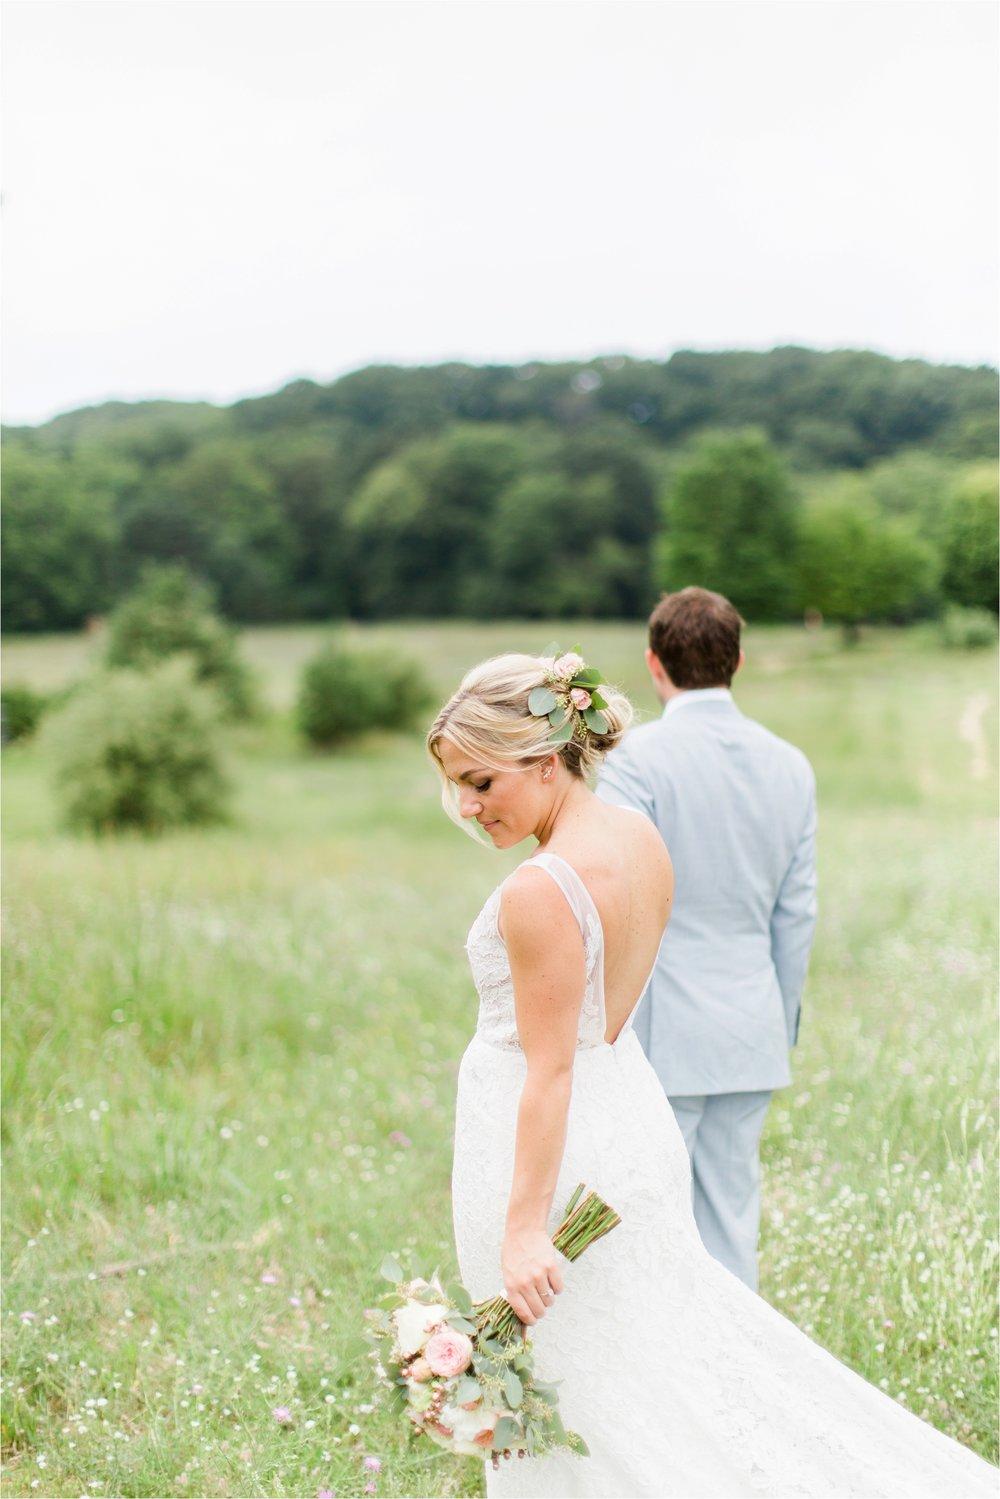 West-Michigan-wedding-photographer-Tifani-Lyn-The-Felt-Mansion-Estate-Wedding-Venue-Rose-Gold-Pink-Lis-Davis_0022.jpg